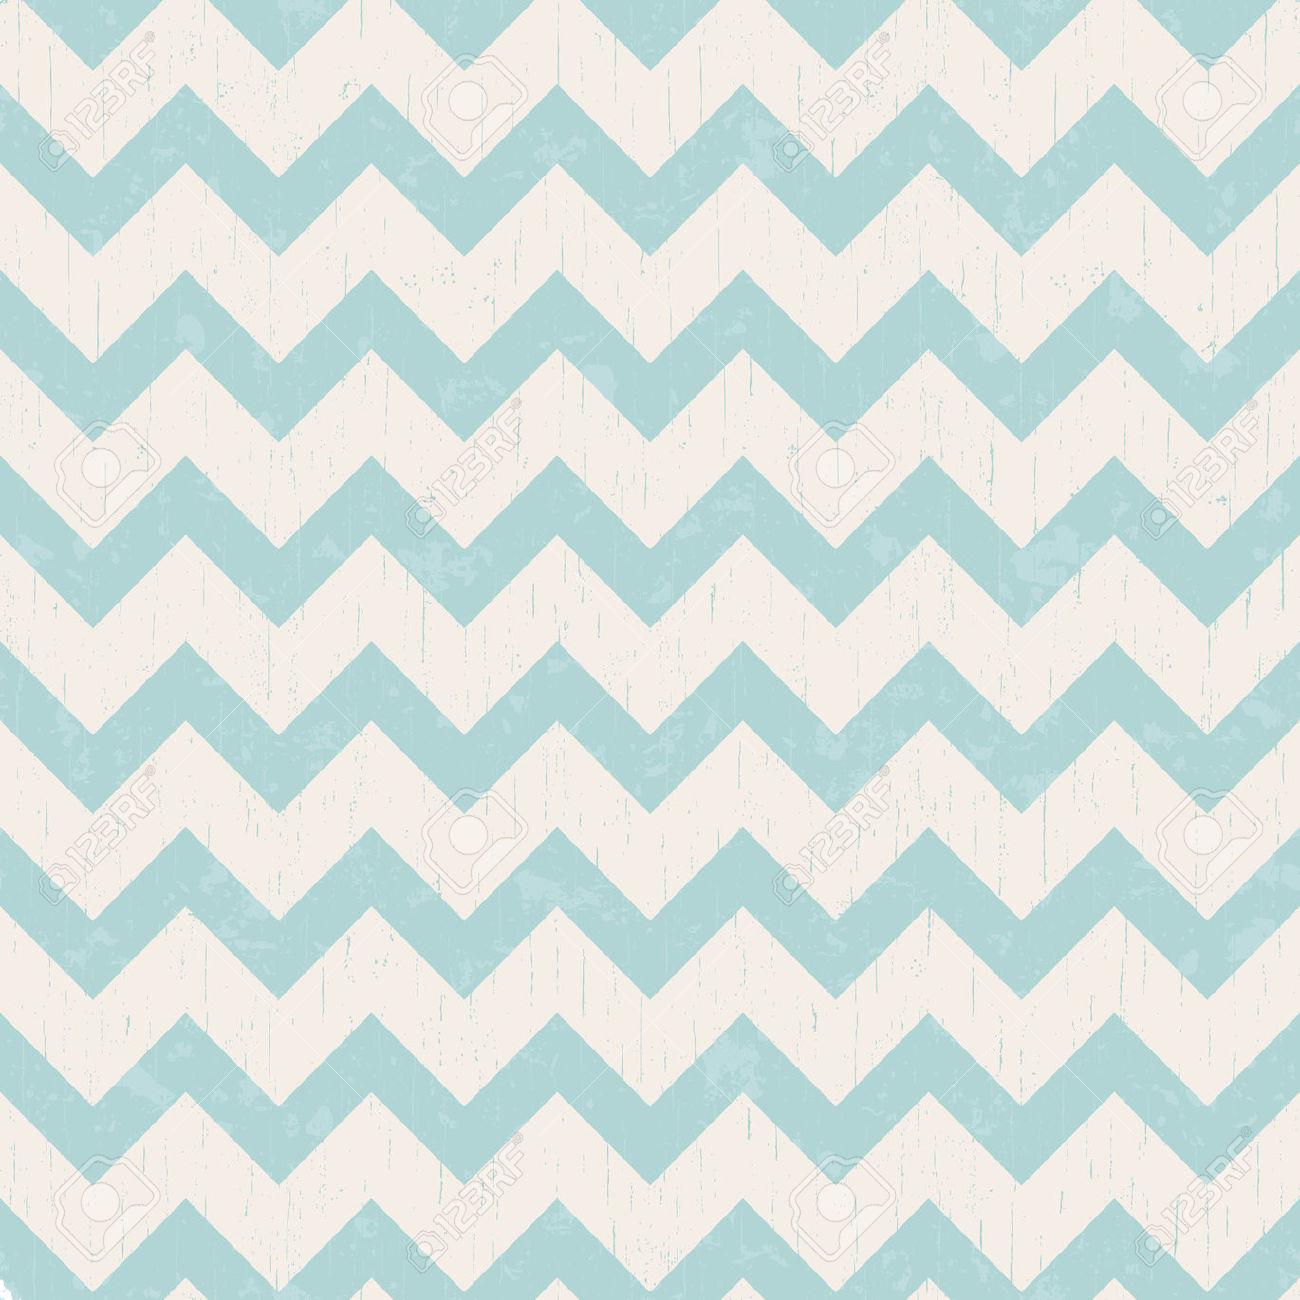 distressed zig zag pattern